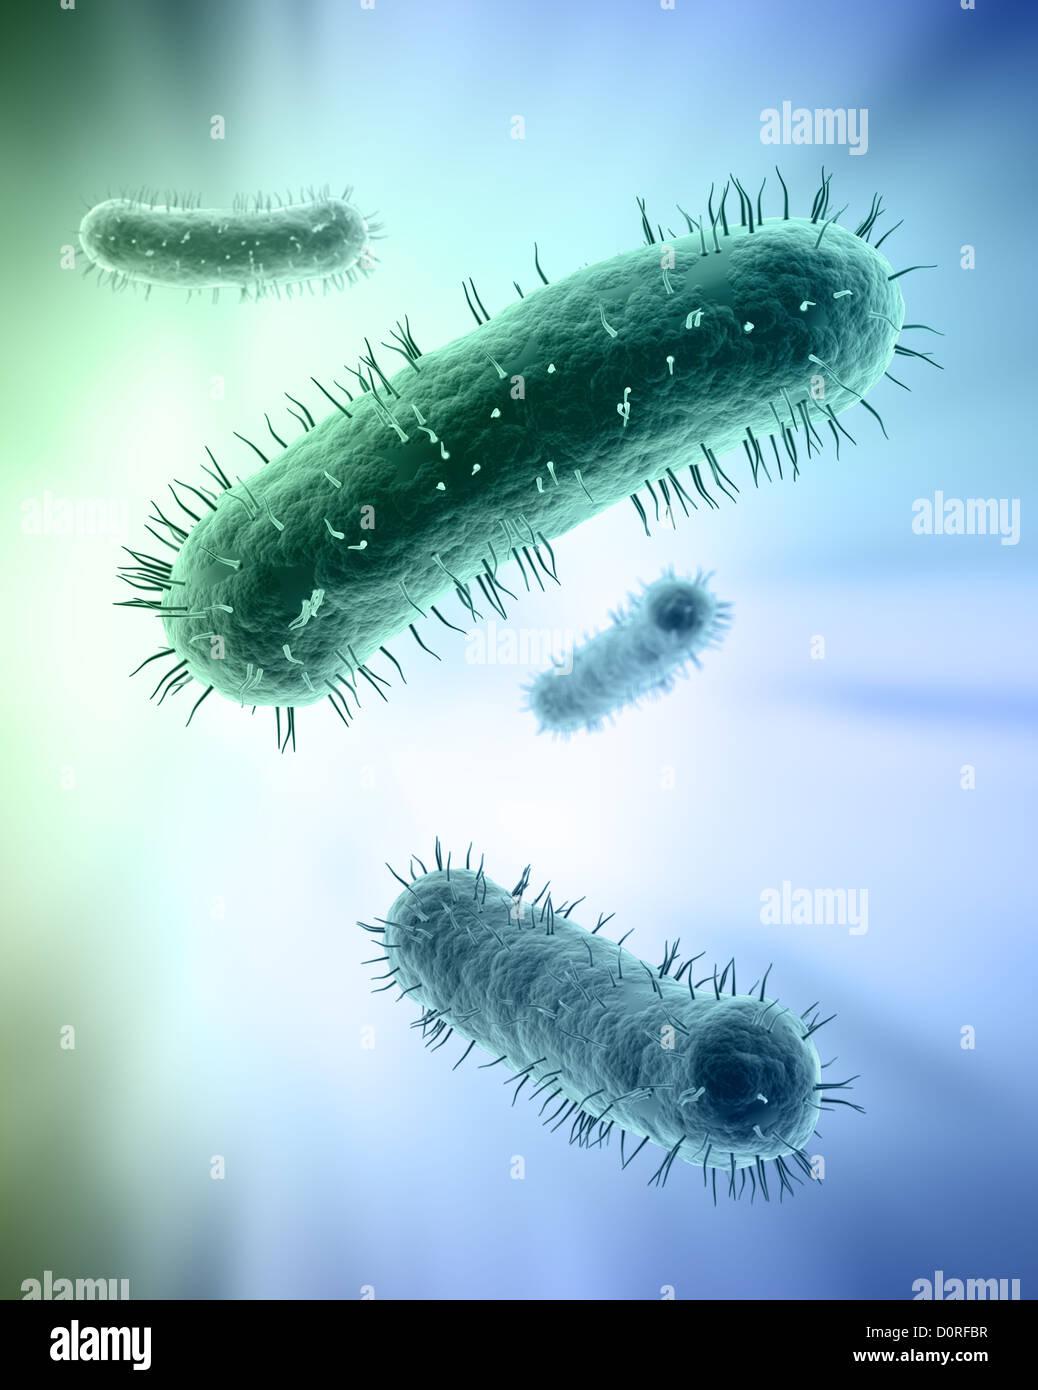 Scientific illustration of bacteria - Stock Image